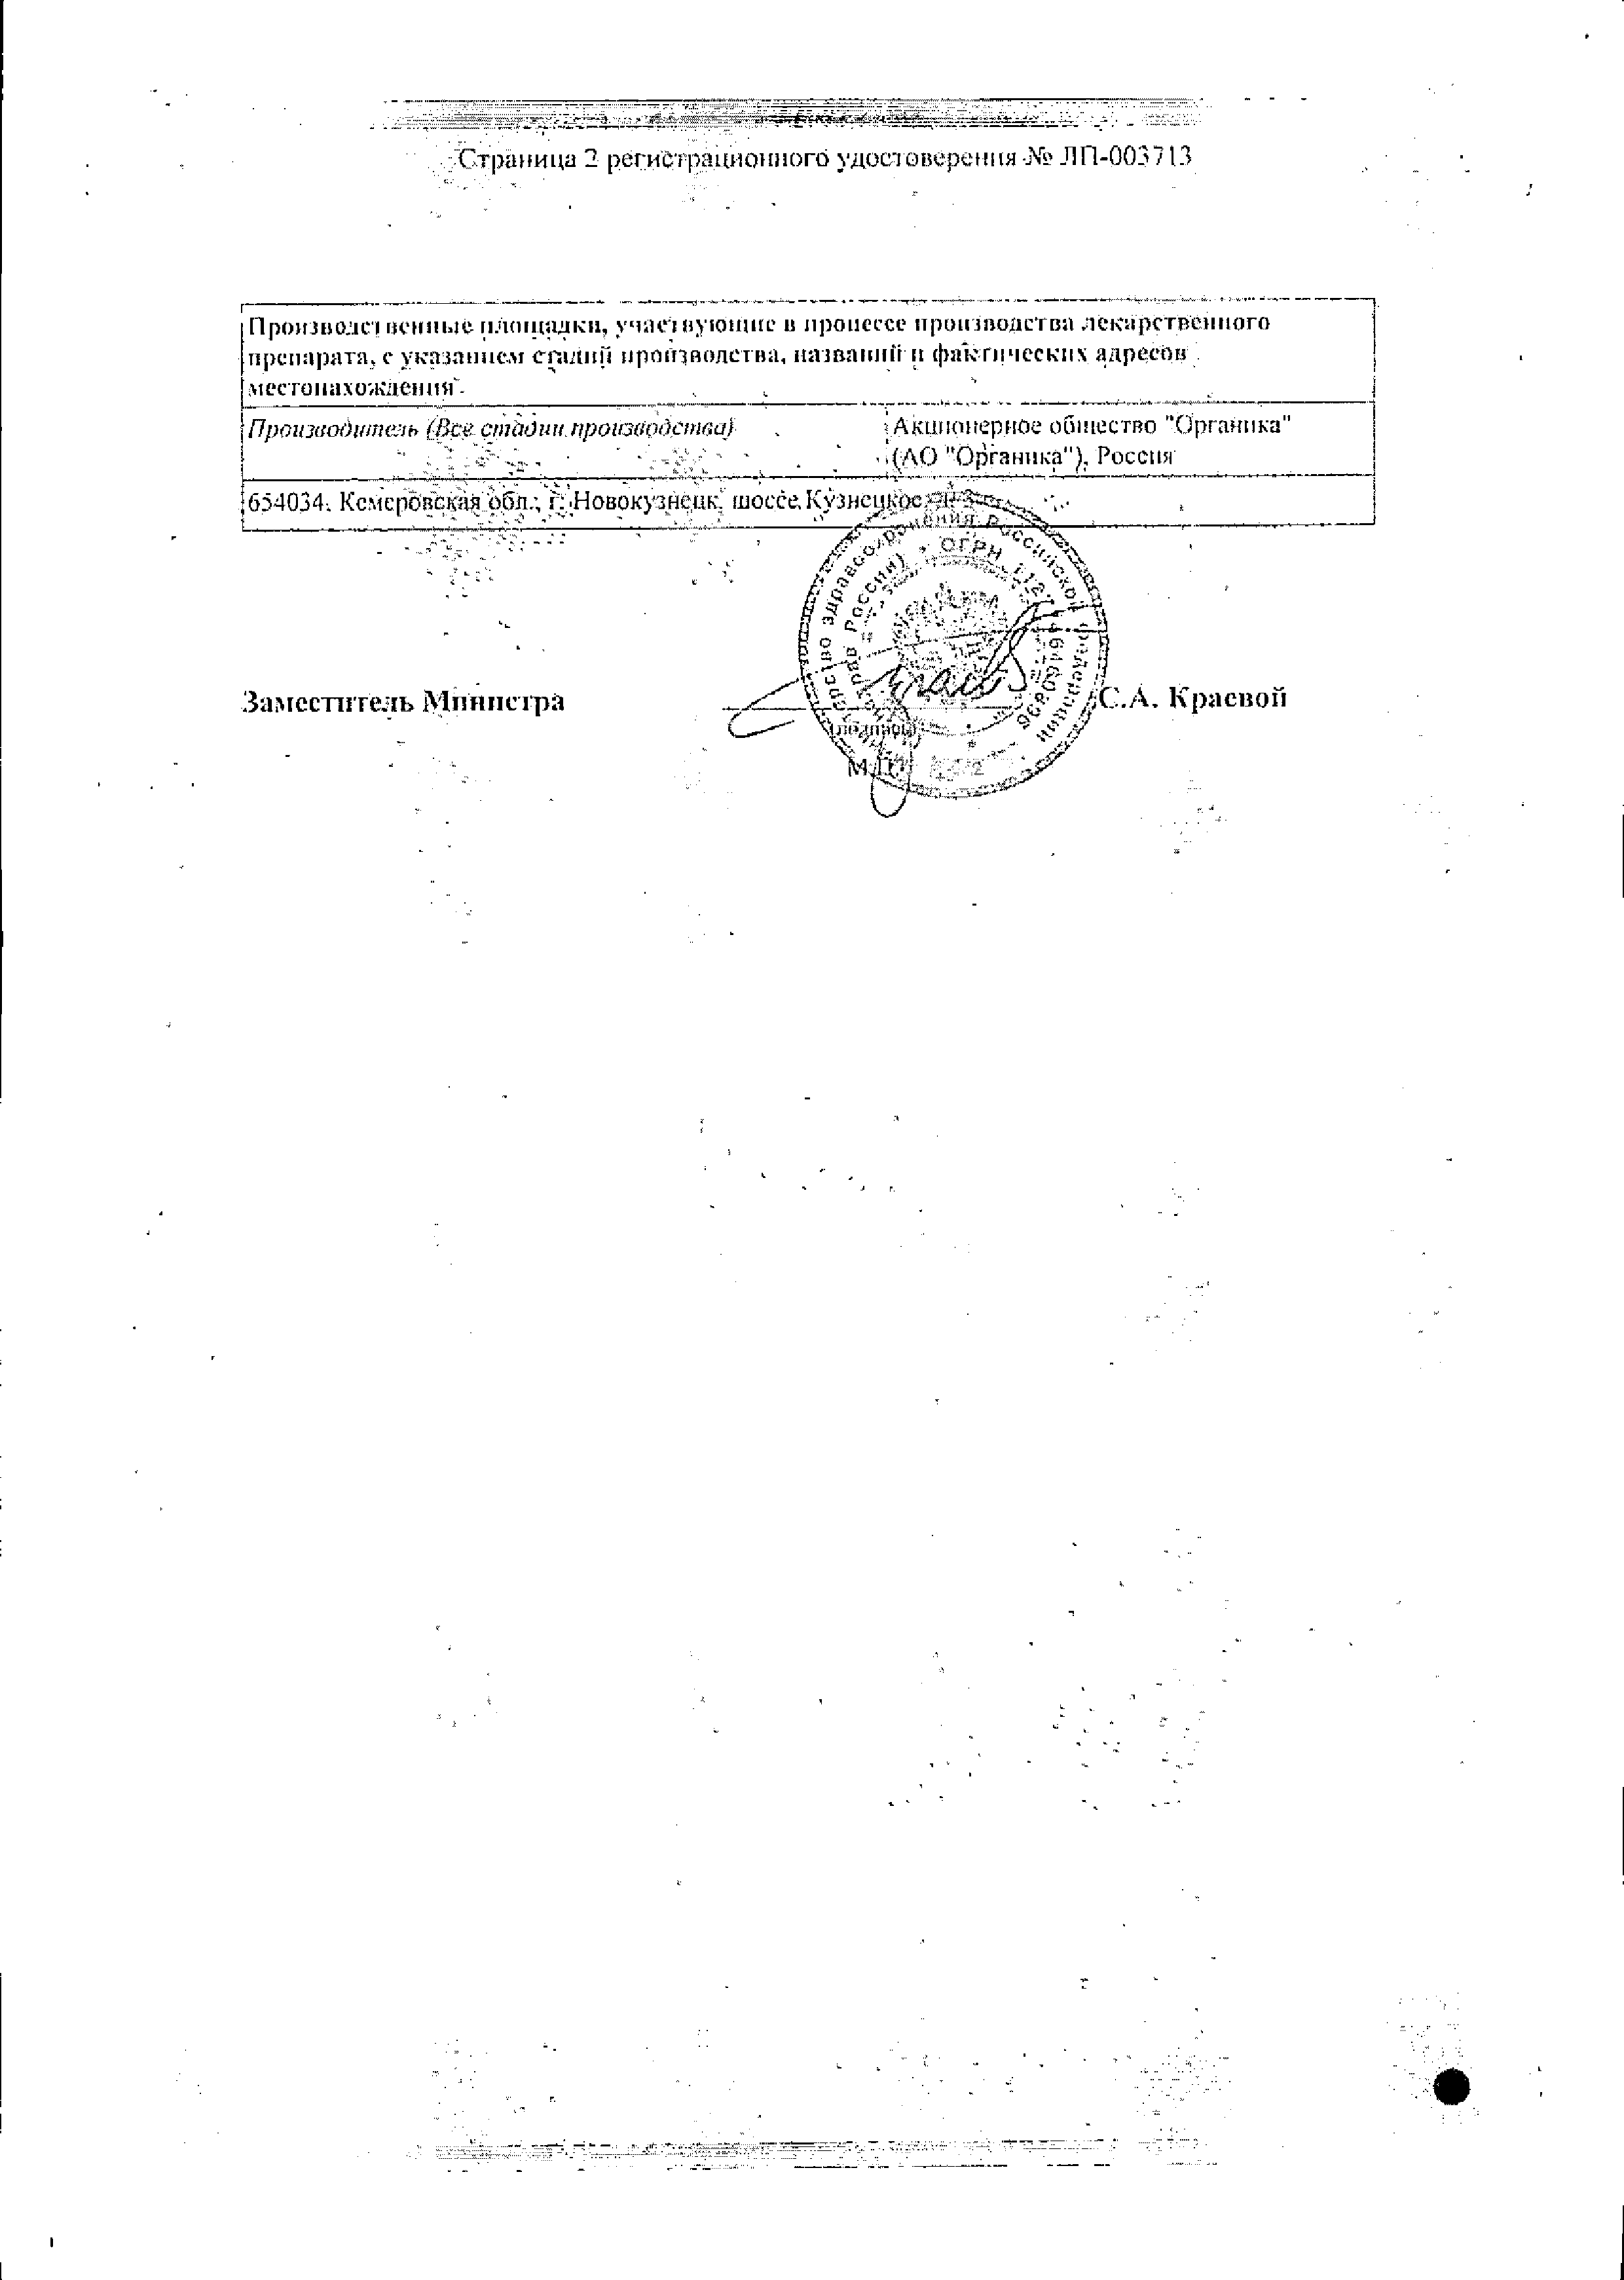 Венлафаксин Органика сертификат